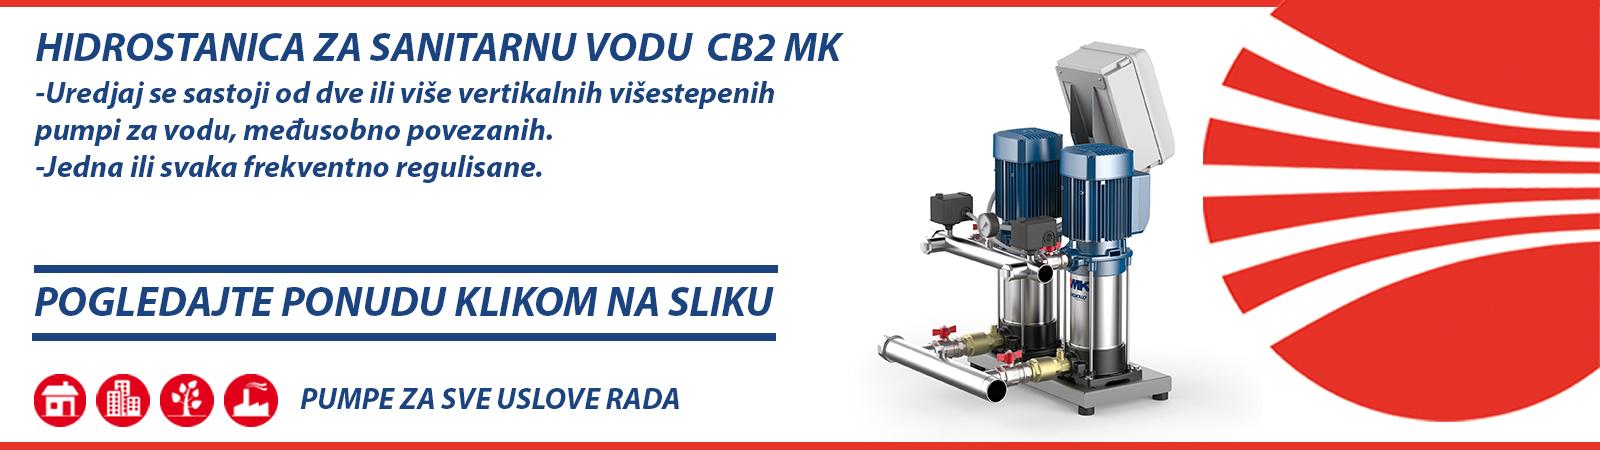 Hidrostanica za sanitarnu vodu CB2 MK Pedrollo